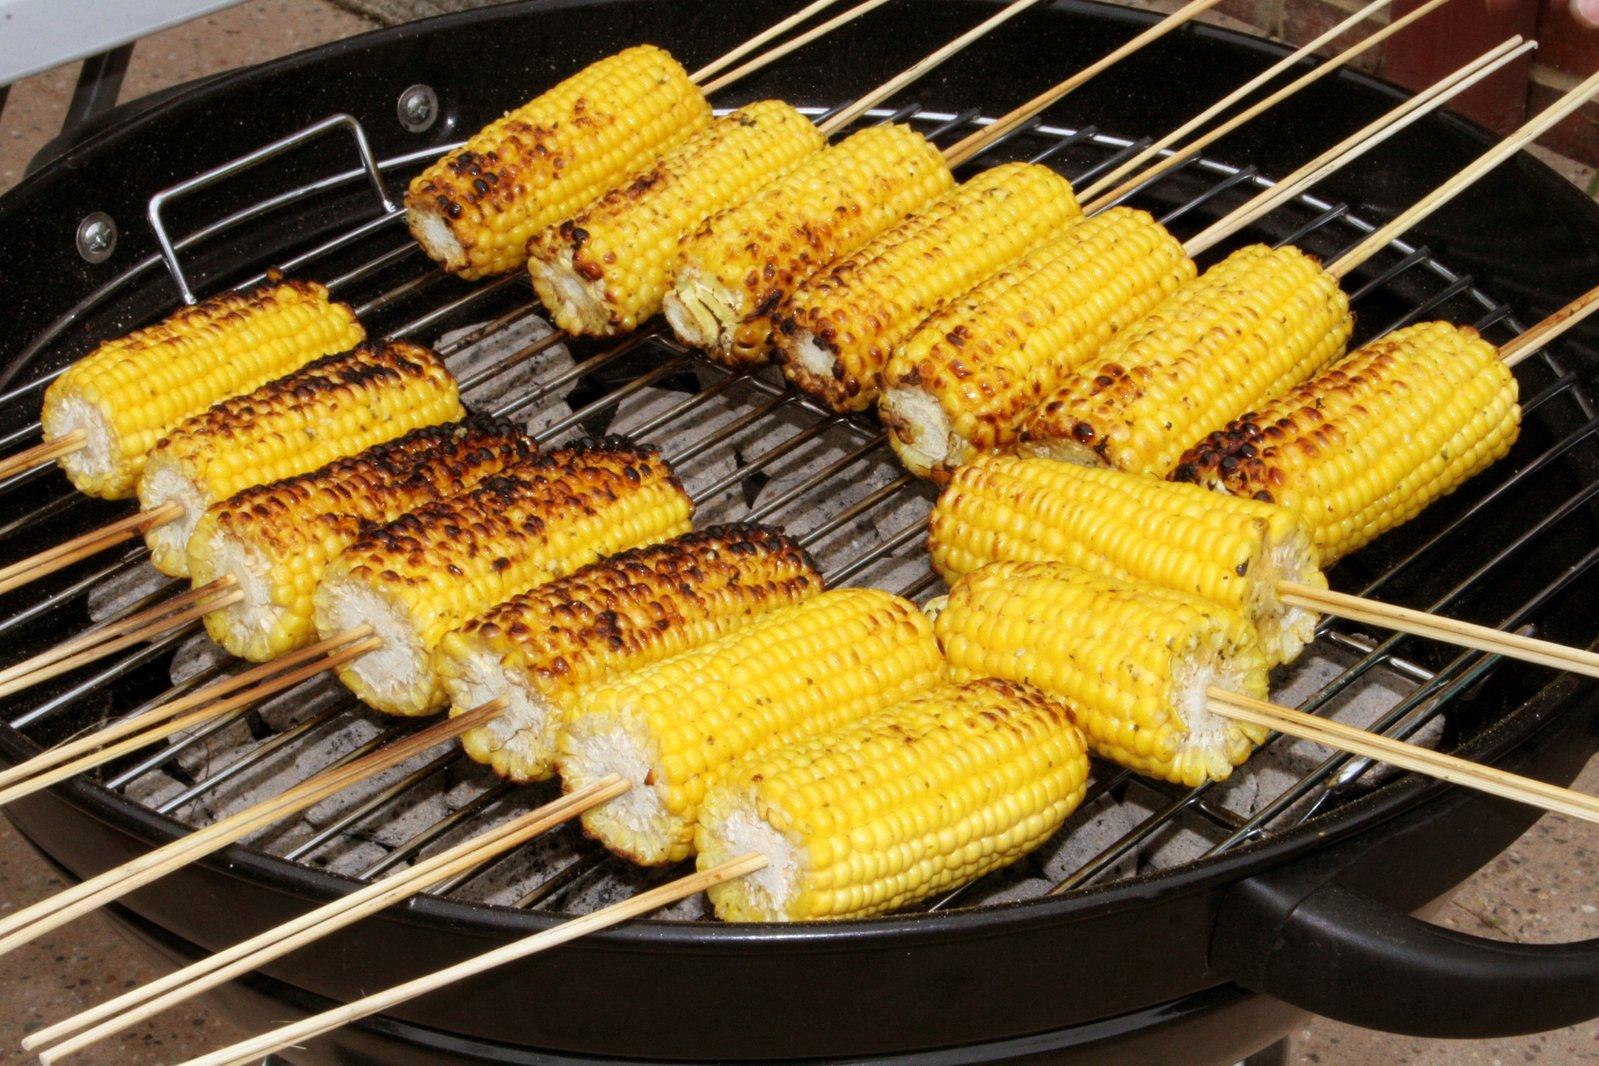 corn-grilled-1326043.jpg